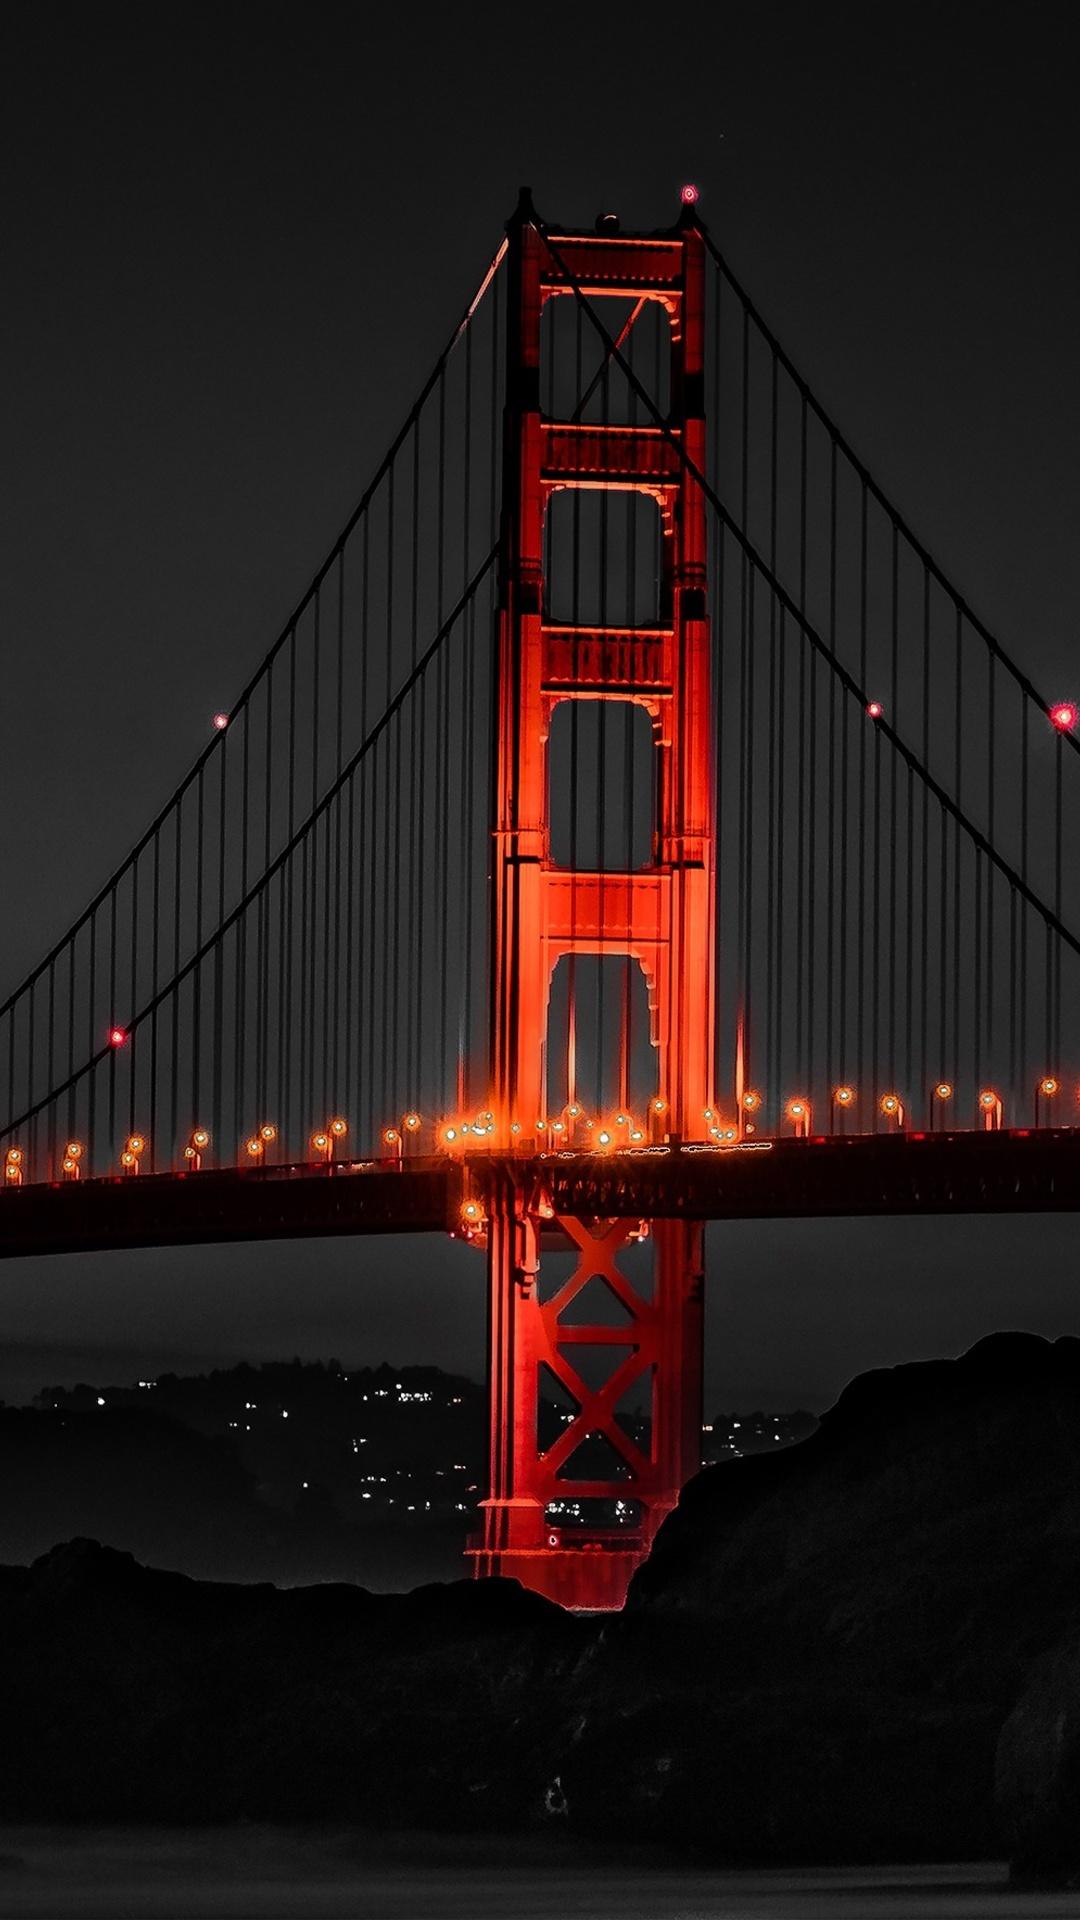 1080x1920 Golden Gate Bridge San Francisco Night Iphone 7 6s 6